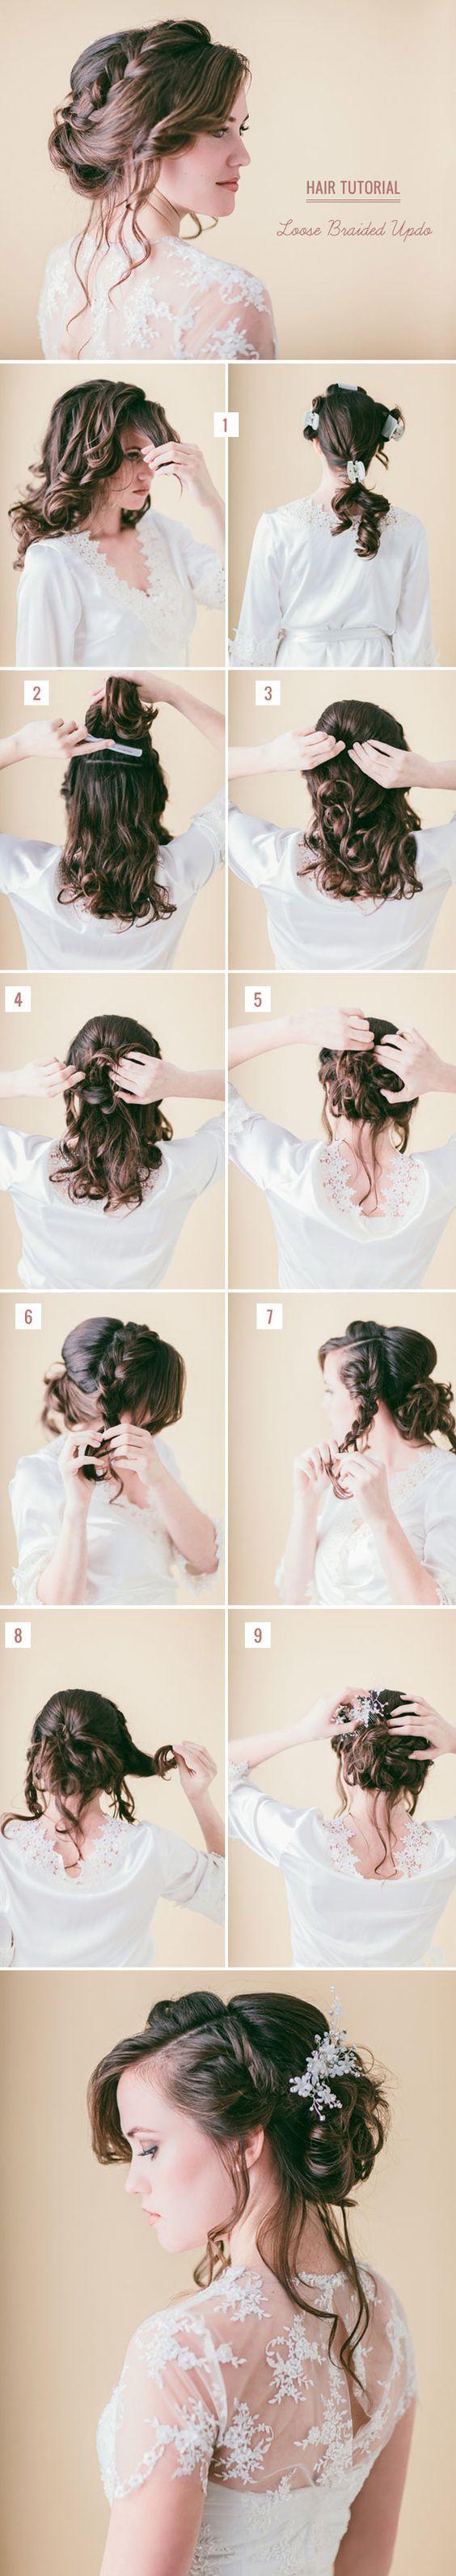 loose braided updo diy wedding hairstyle ideas